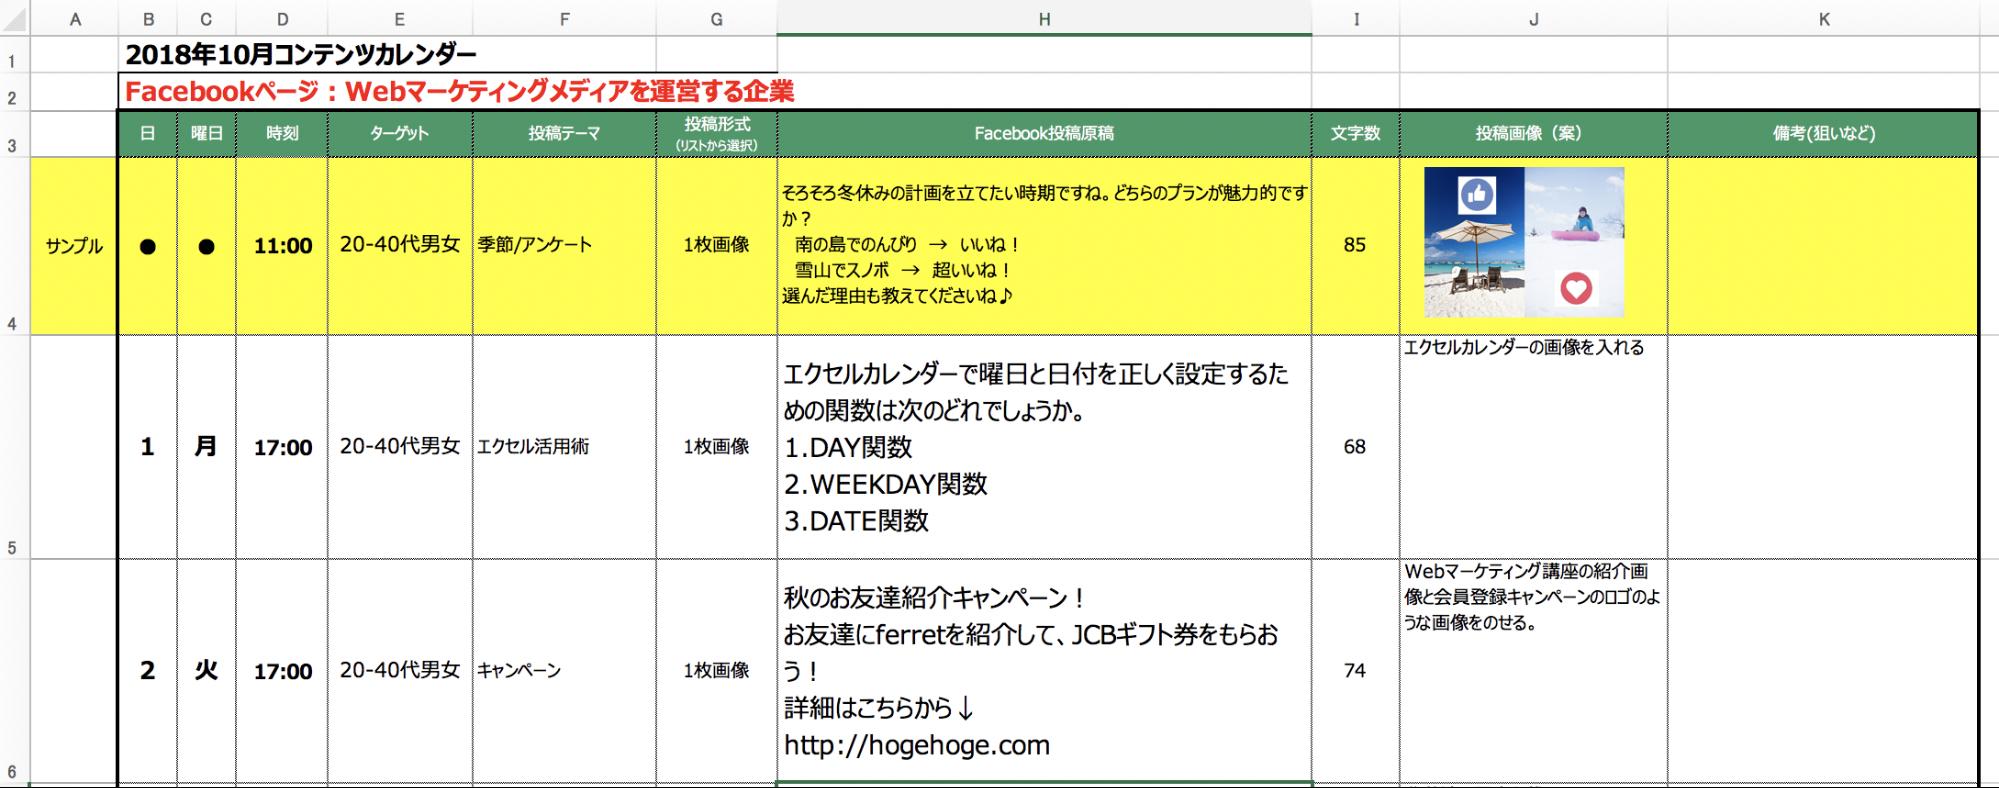 calendar_記入.png